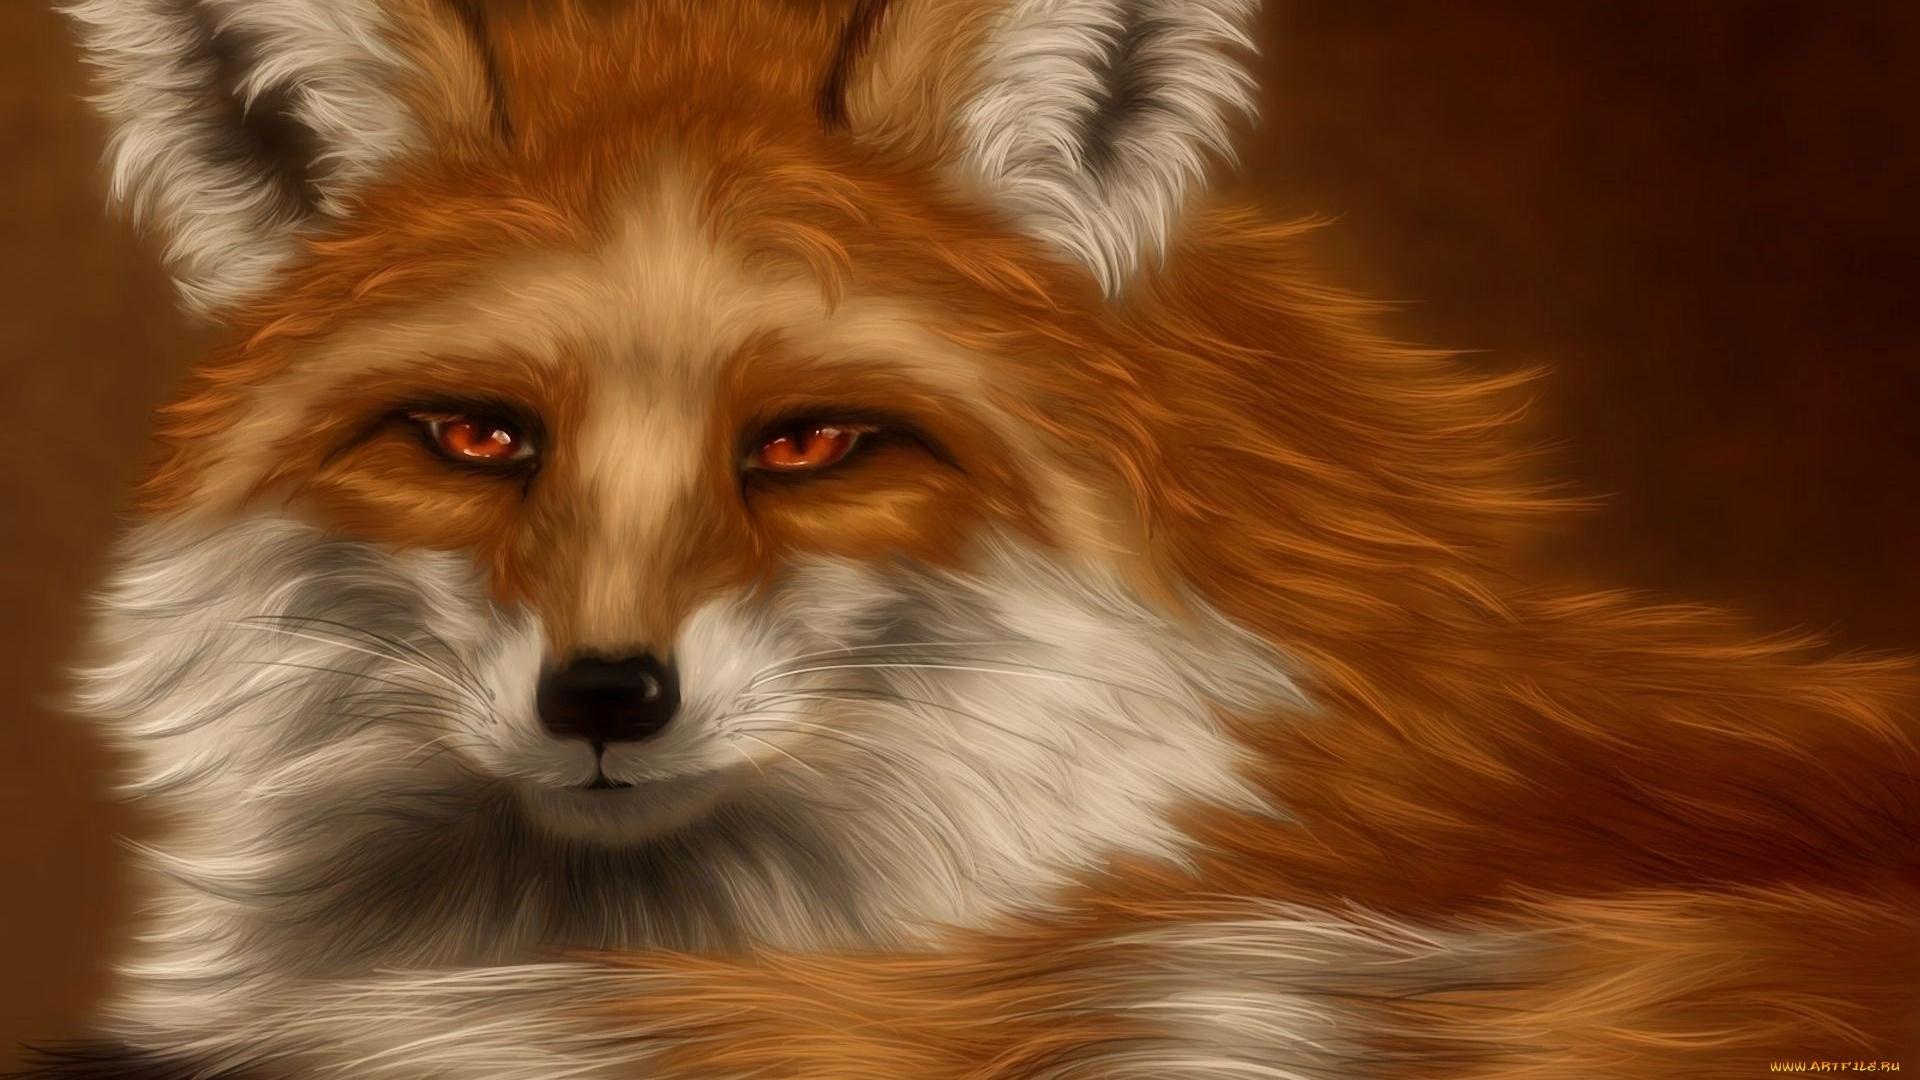 Fox Art desktop wallpaper hd